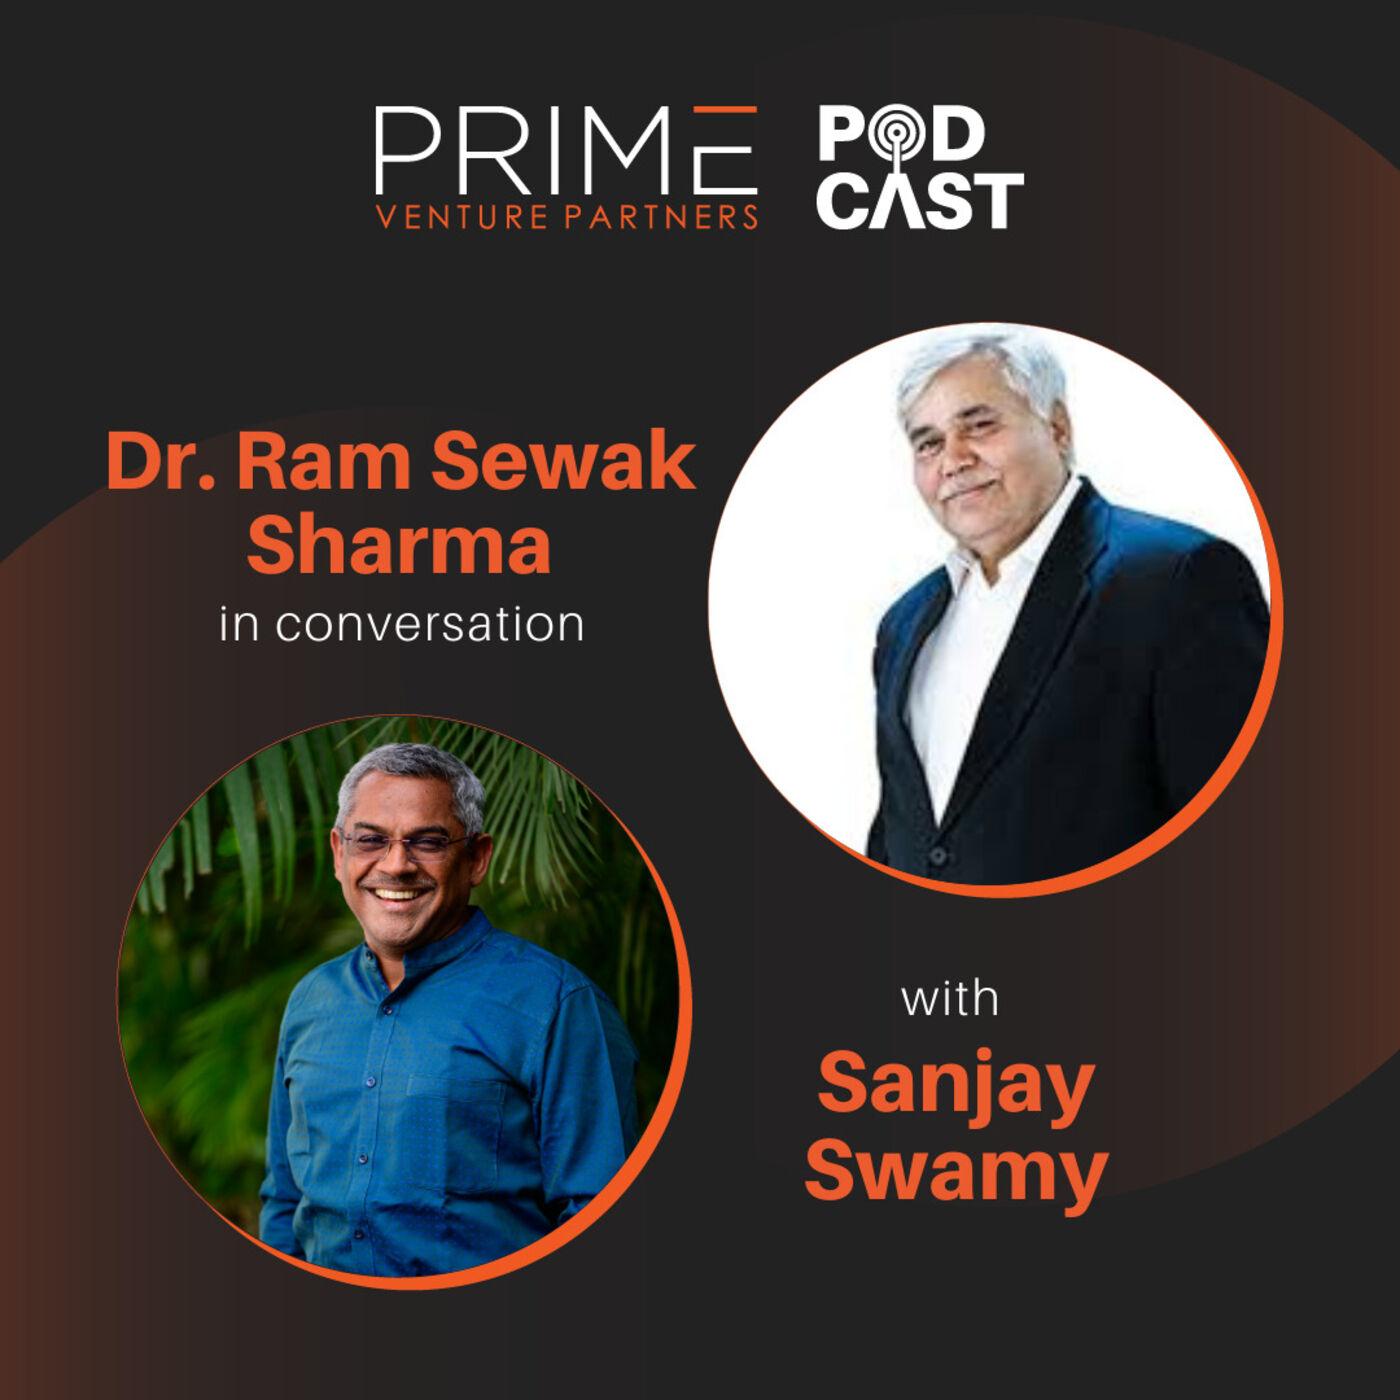 #56 The Aadhaar Story: Digitising Billion+ Identities with Dr. Ram Sewak Sharma Former Chairman, TRAI